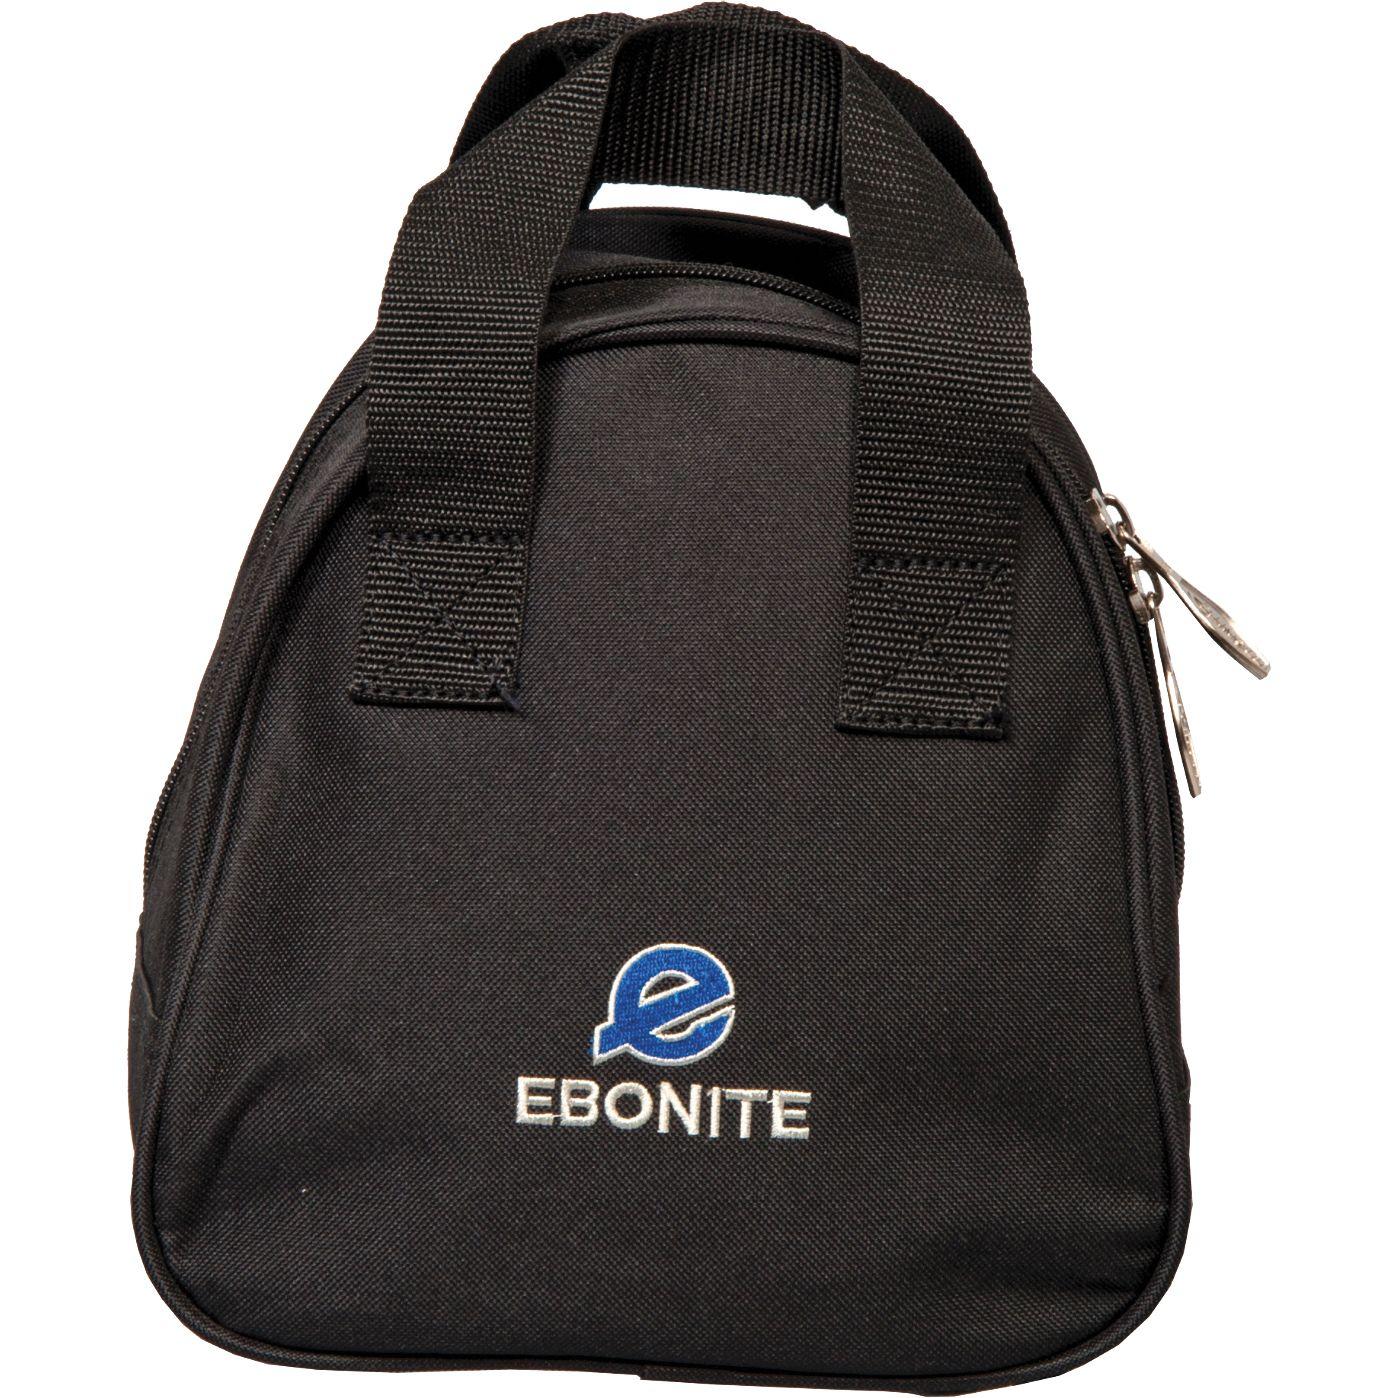 Ebonite Add-A-Bag Bowling Bag